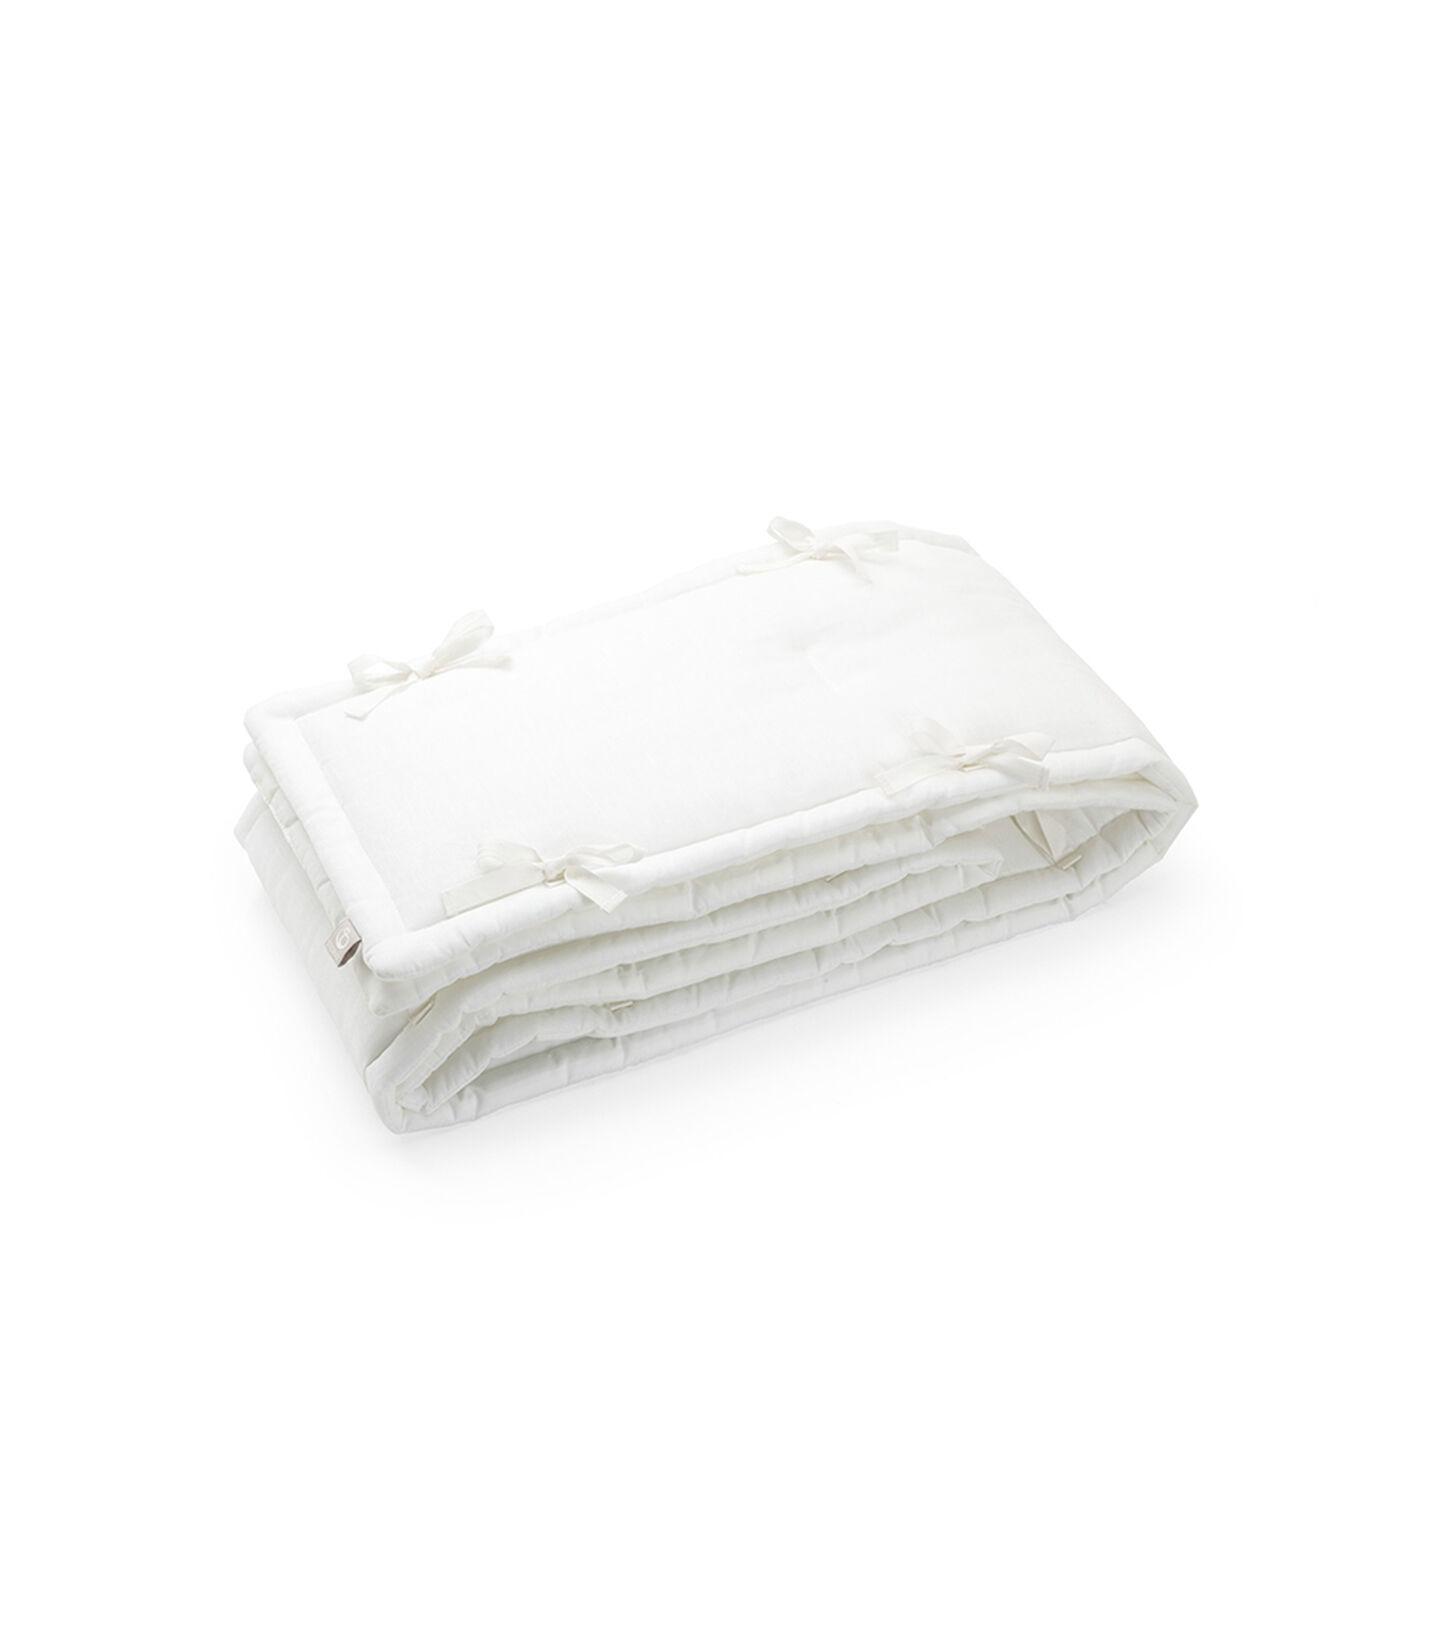 Stokke® Sleepi™ Bumper White, Bianco, mainview view 1